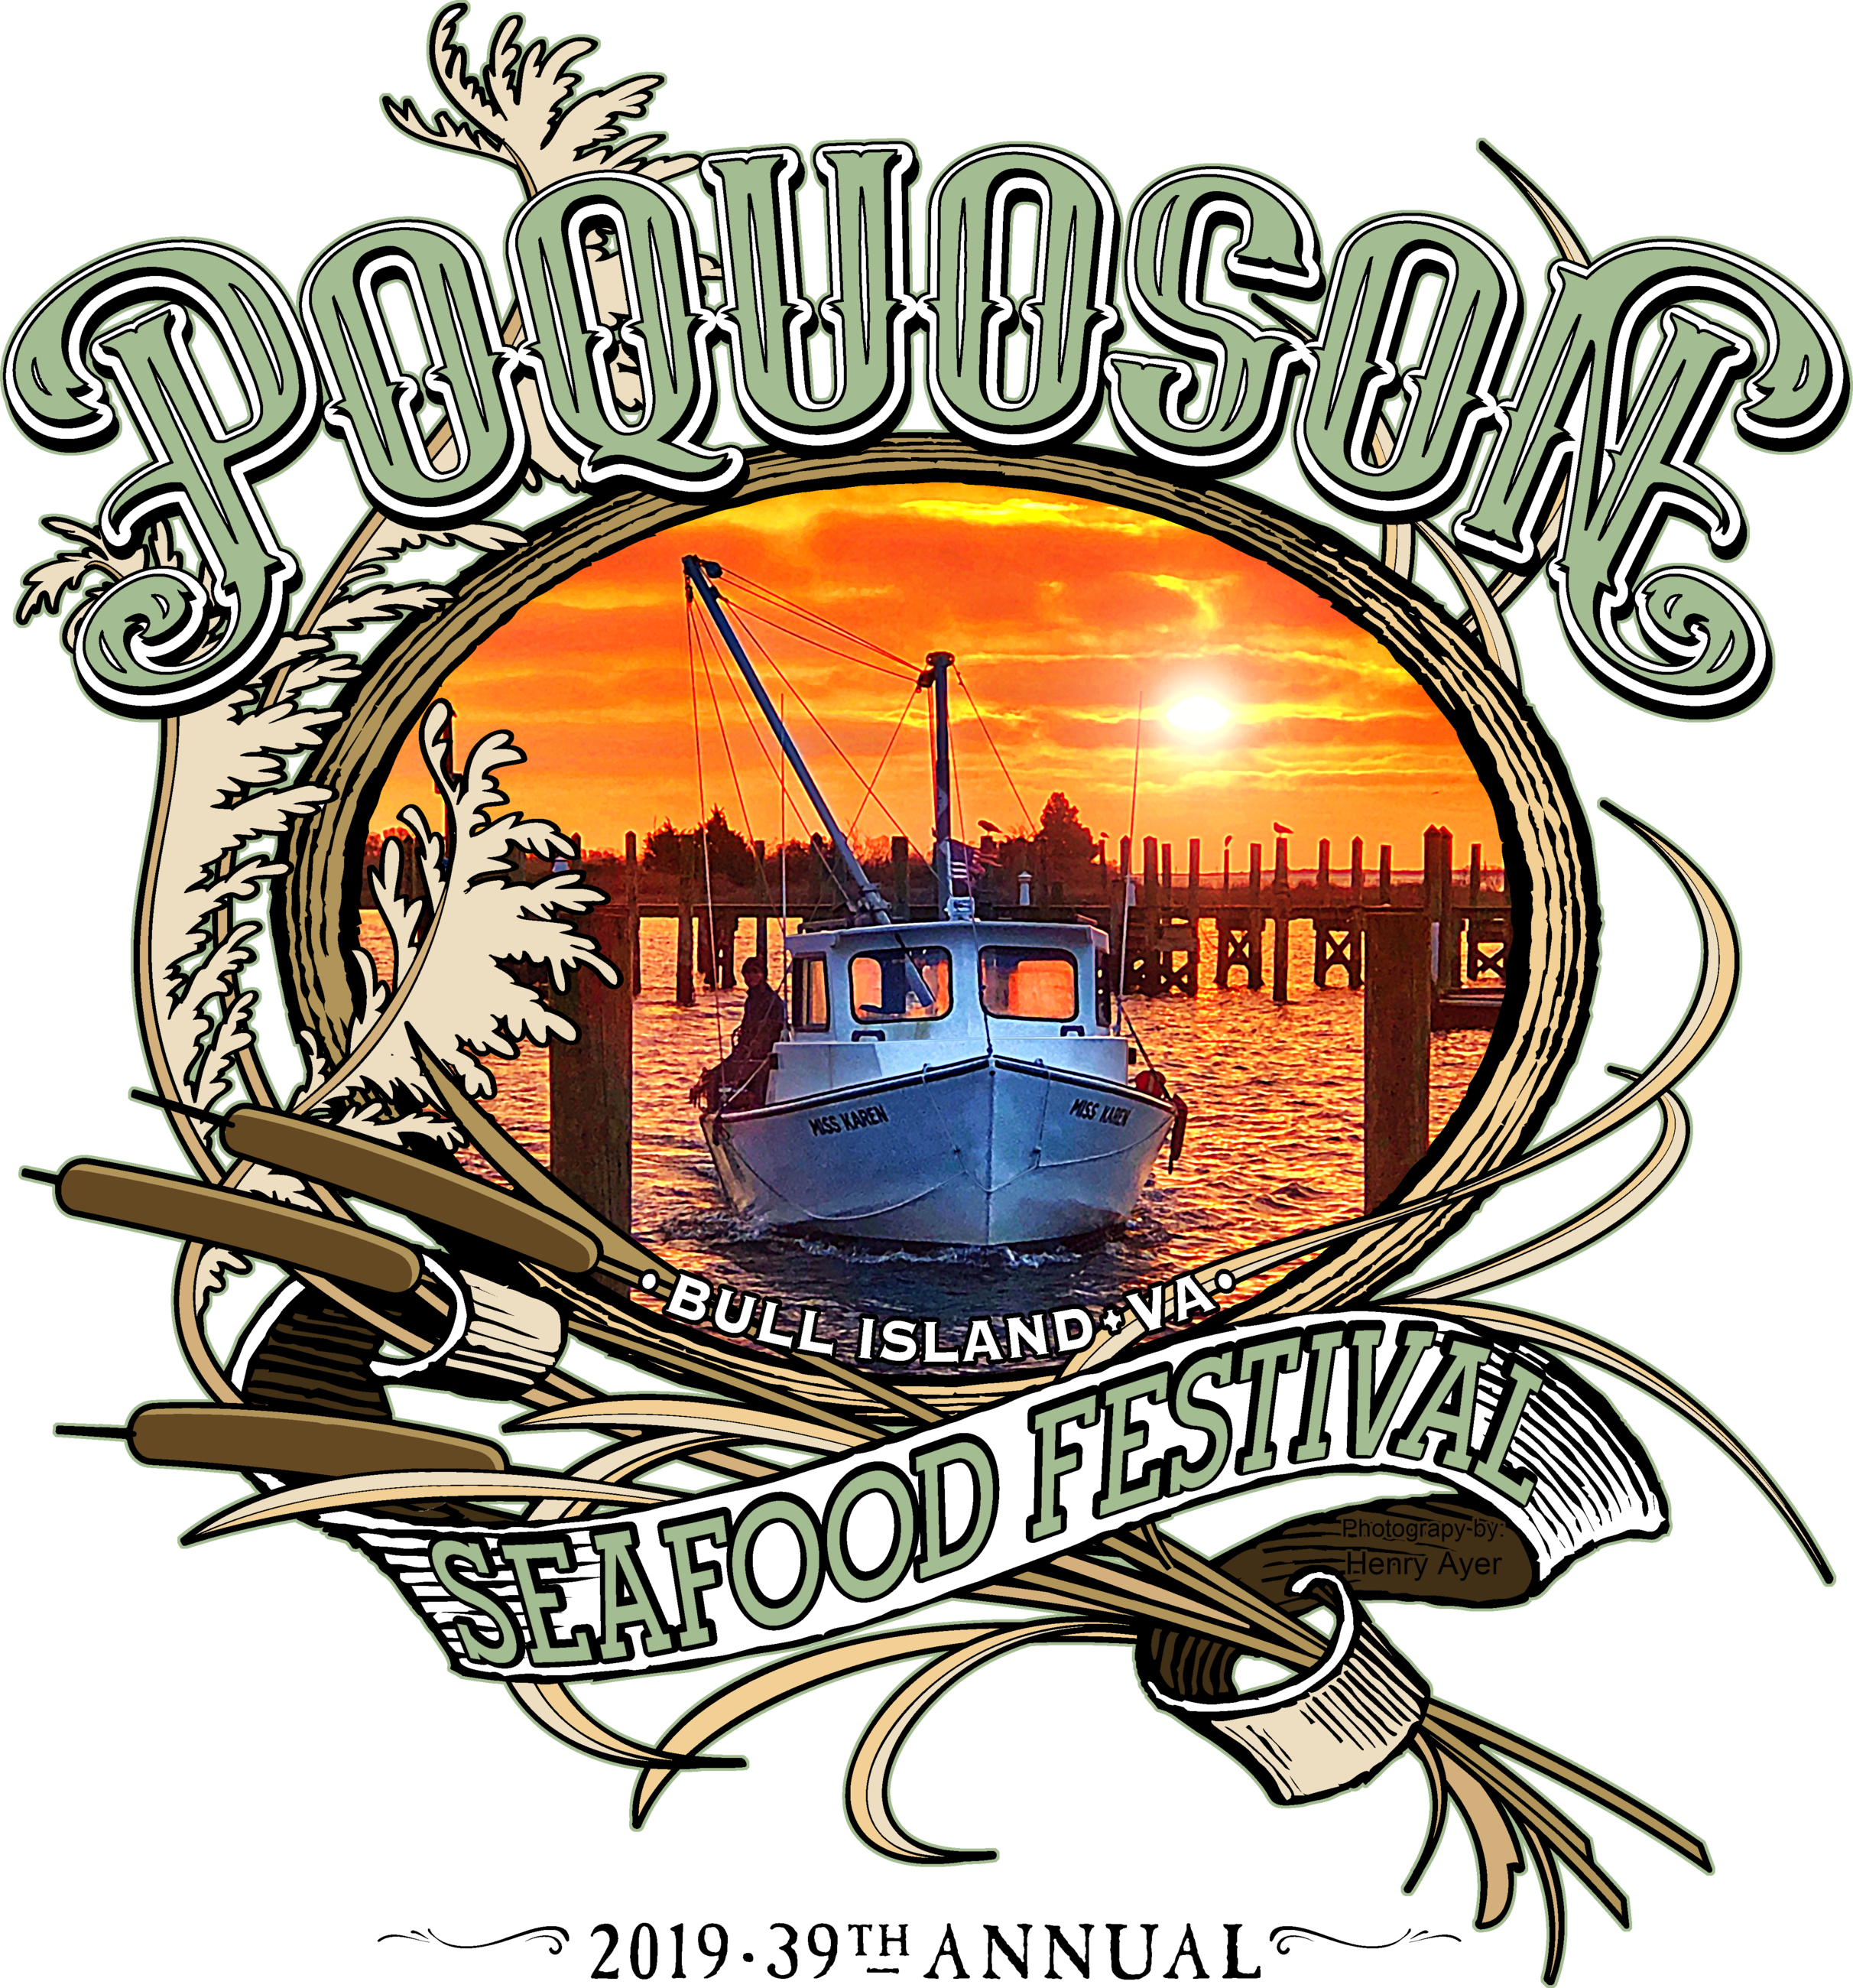 Hampton Beach Seafood Festival 2020.Poquoson Seafood Festival 2020 Festival 2020